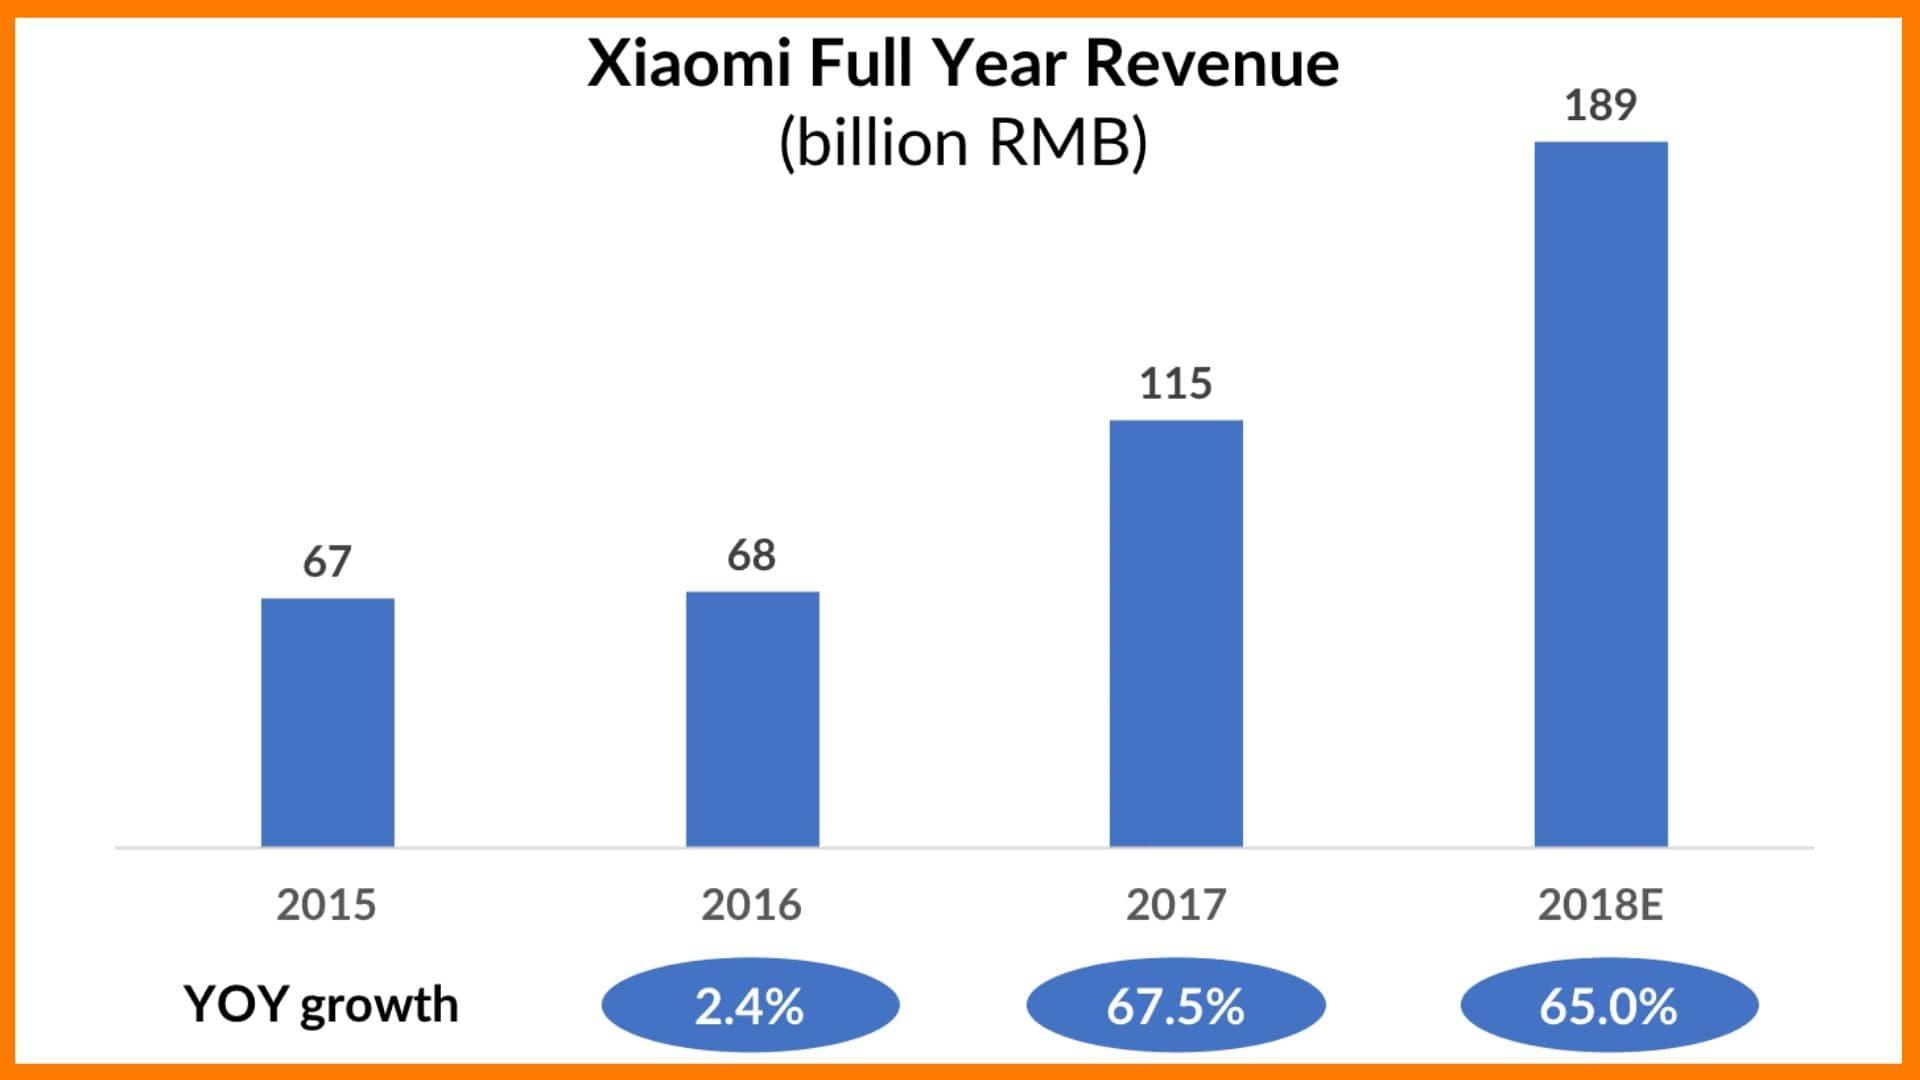 Xiaomi's Full Year Revenue